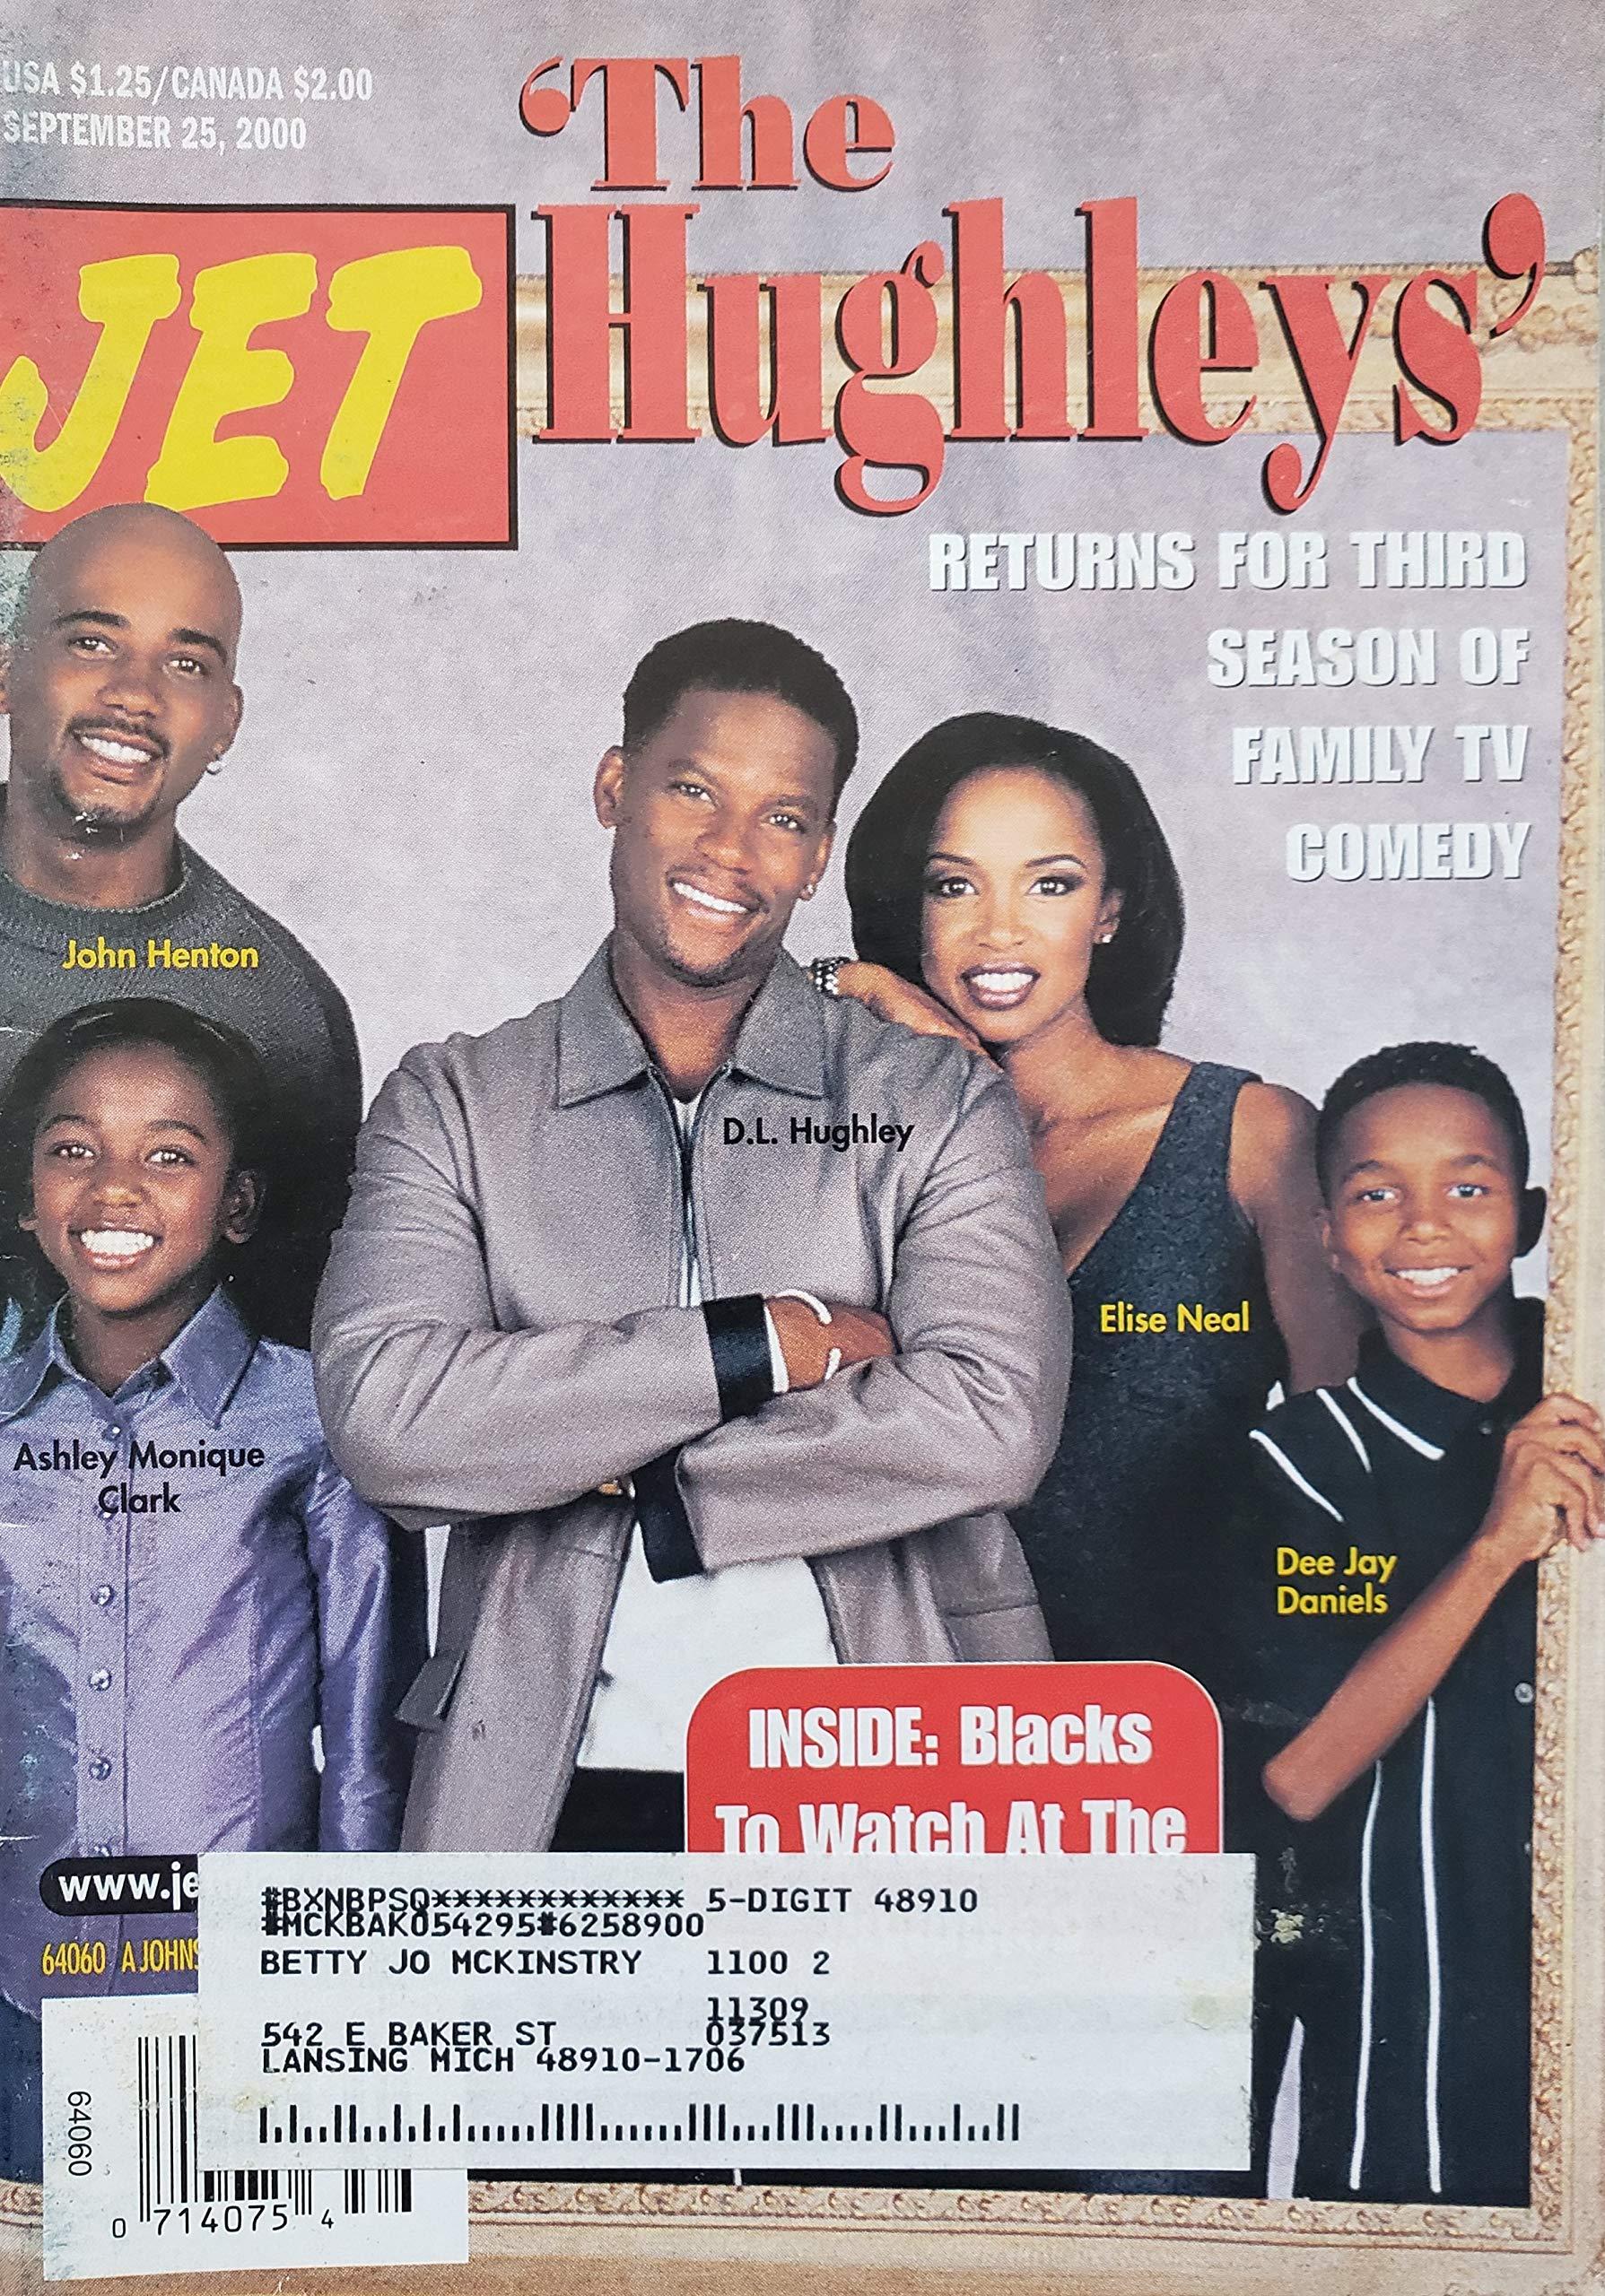 Jet Magazine September 25 2000 The Hughleys Returns For Third Season Of Family Tv Comedy Jet Magazine Amazon Com Books